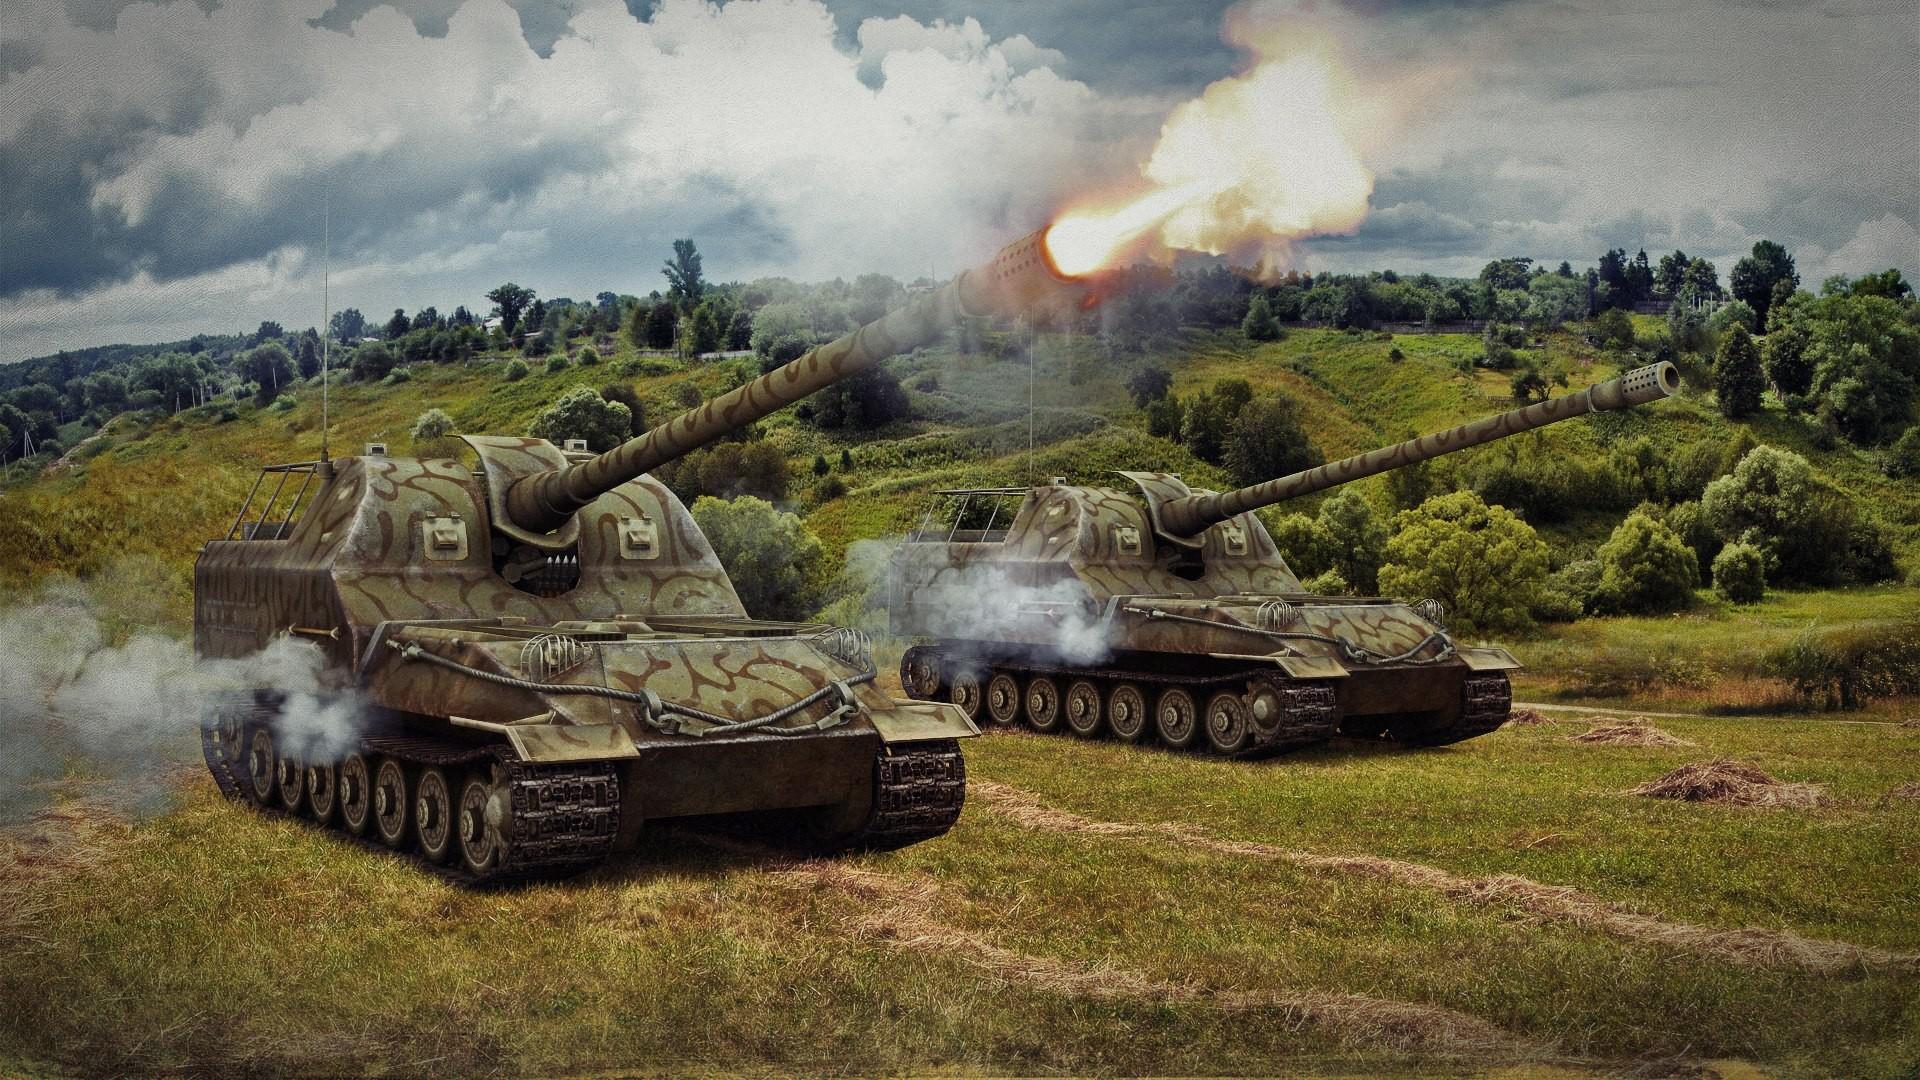 World of Tanks — бесплатная игра про танки. Читайте новости WoT на официальном сайте . World of Tanks